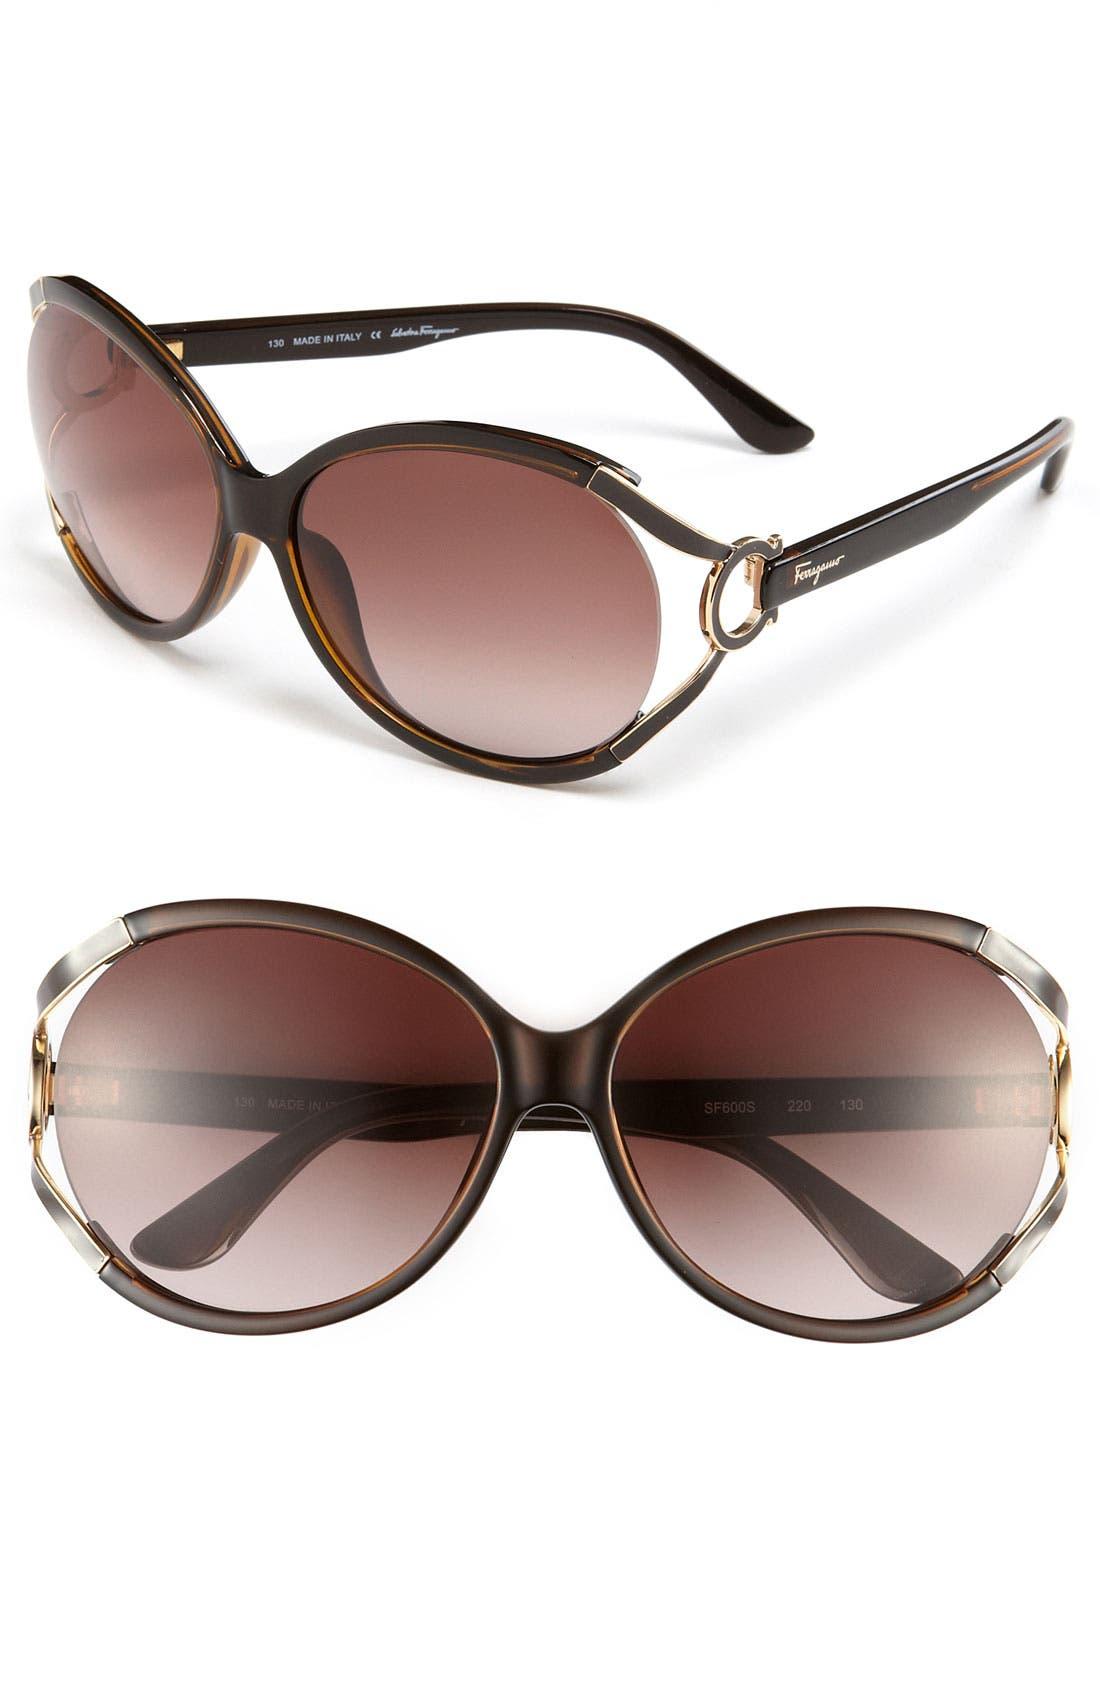 59mm Oversized Sunglasses,                         Main,                         color, DARK BROWN/ BROWN GRADIENT